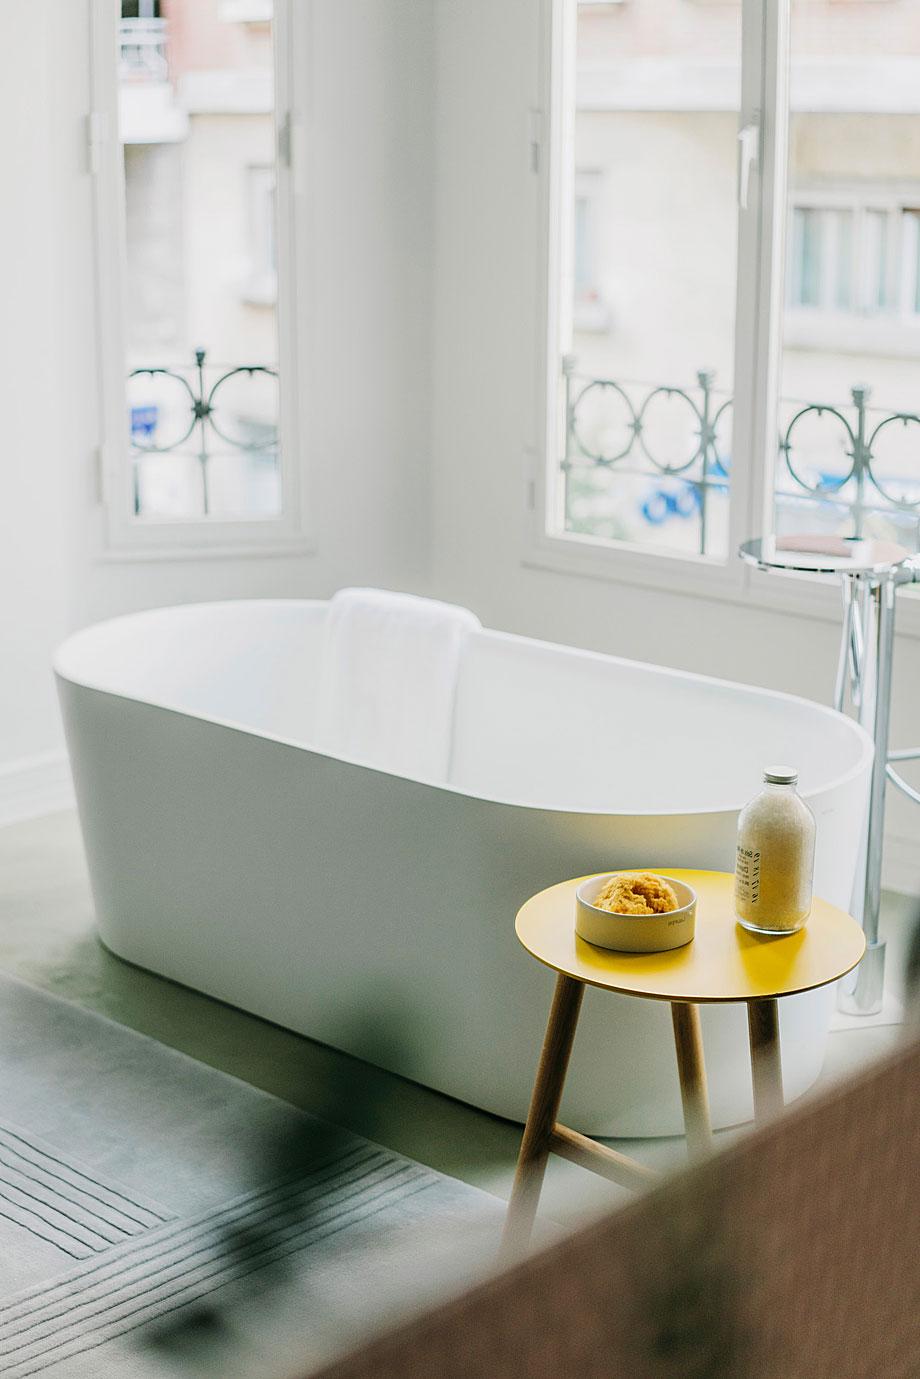 laufen-showroom-baños-madrid-patricia-urquiola (13)